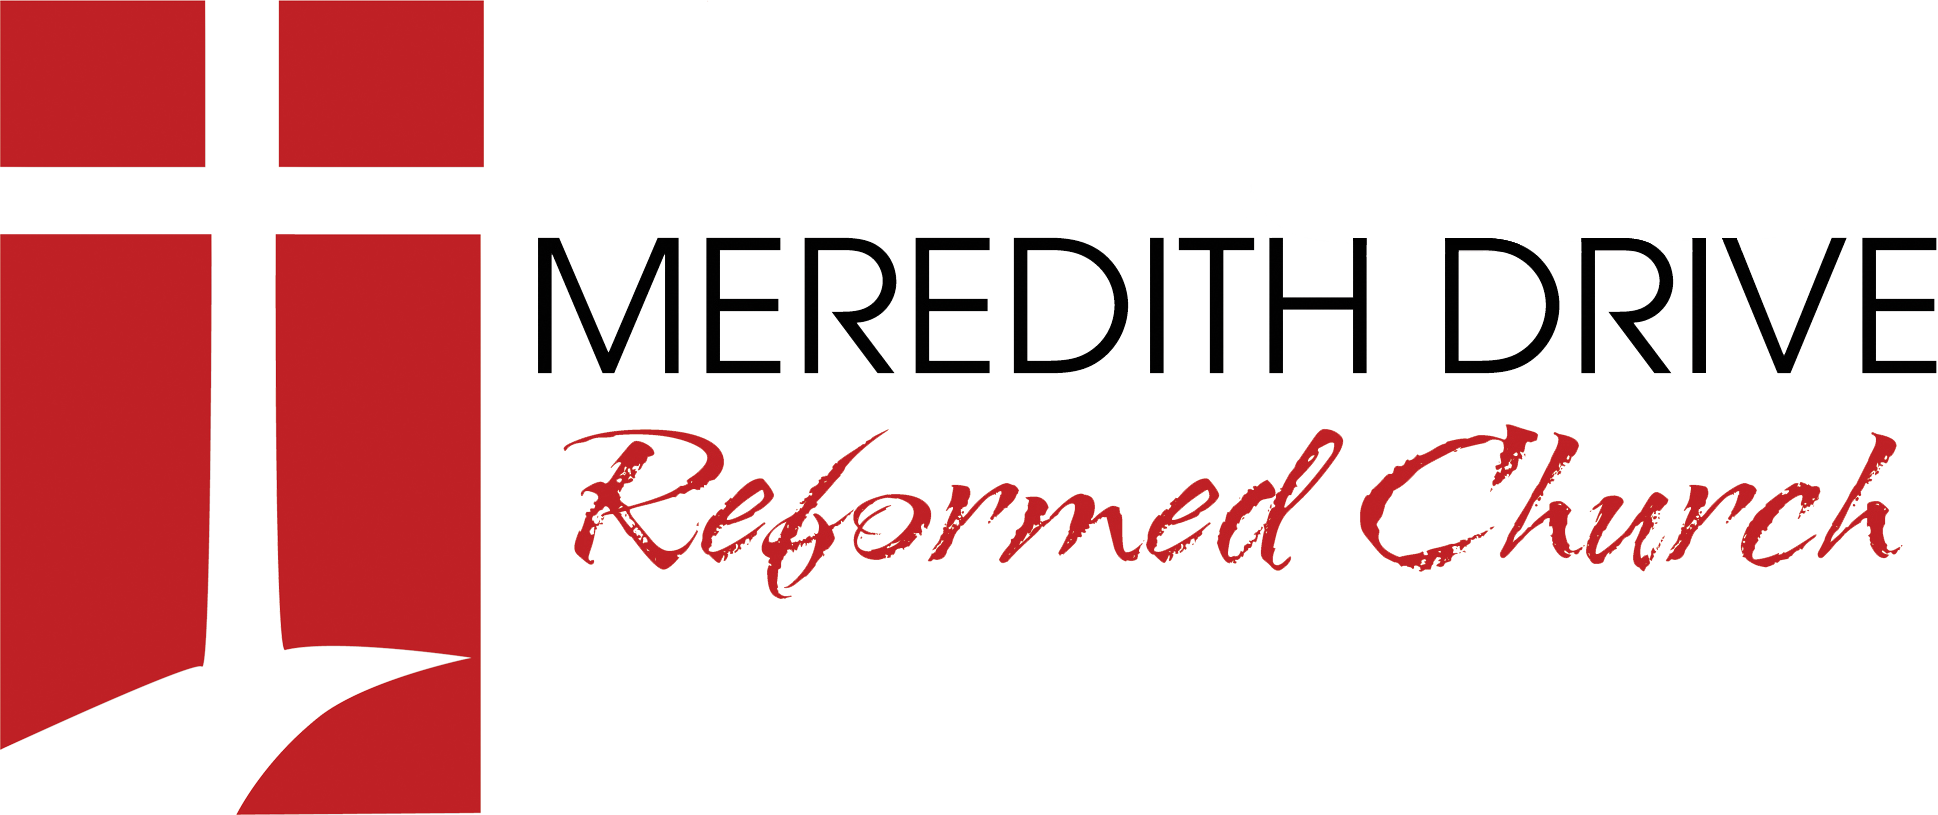 meredith-drive-reformed-church-sponsor-logo-impact-iowa-honoring-americas-heroes